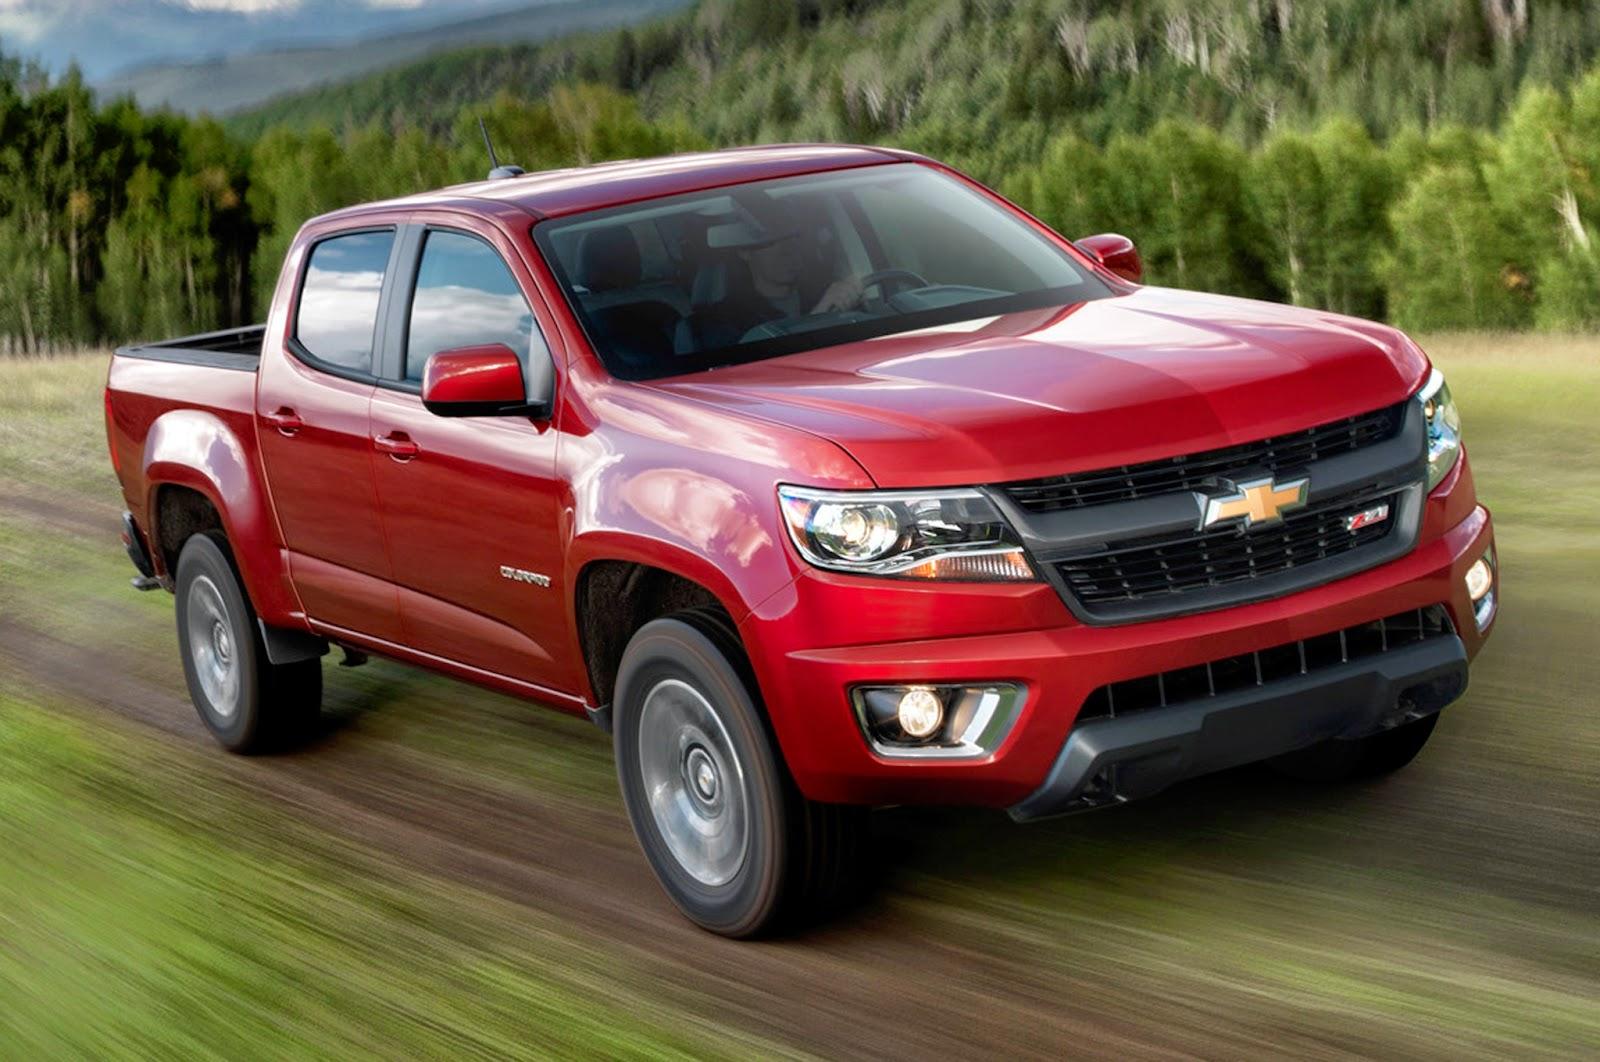 2015 Chevy Colorado Is Midsize Pickup Fuel Economy Leader